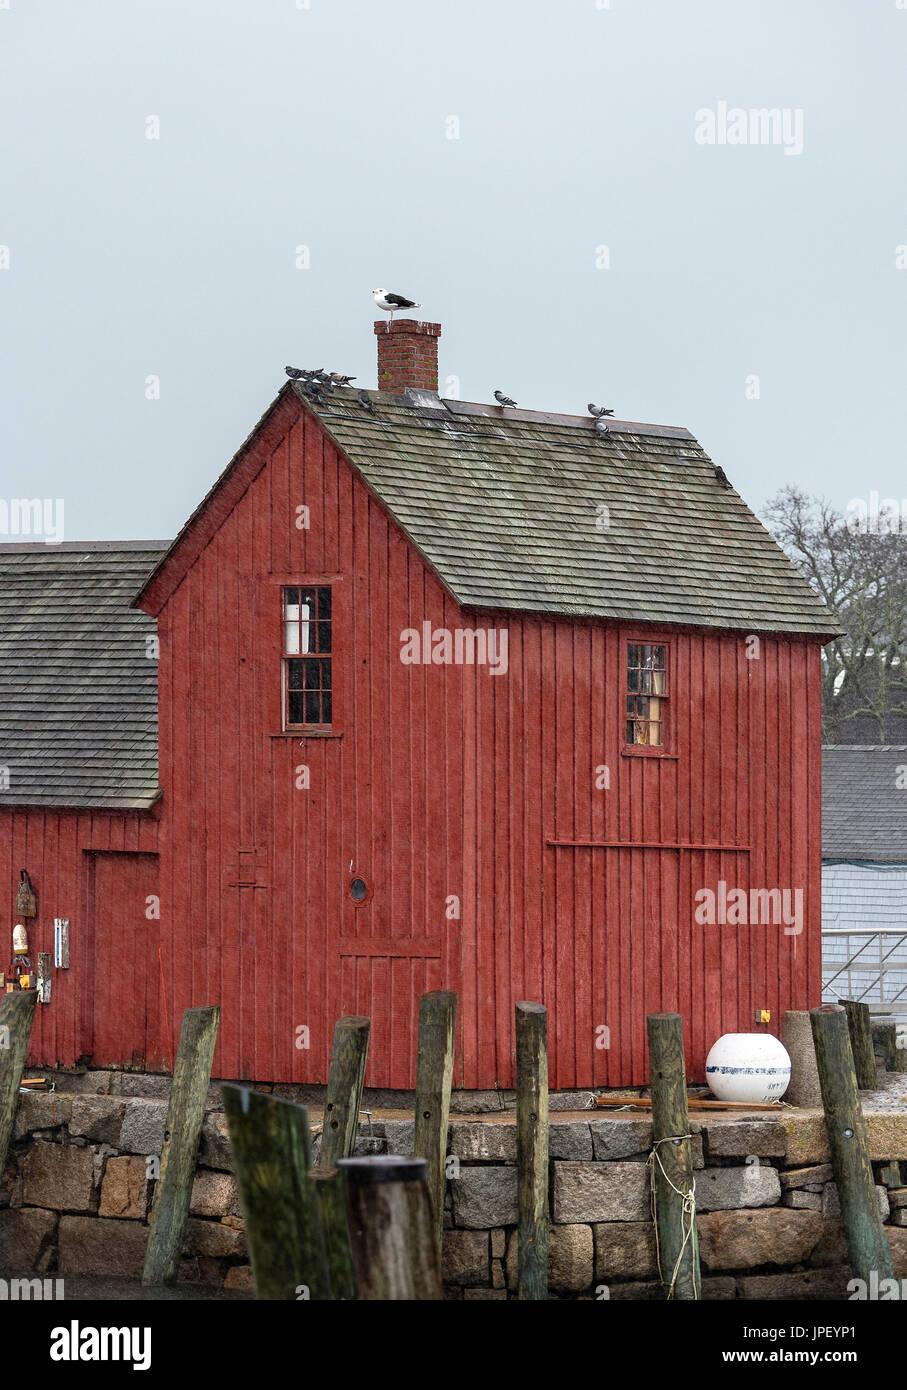 La pesca shack, Motif número 1, Rockport, Massachusetts, EE.UU. Imagen De Stock